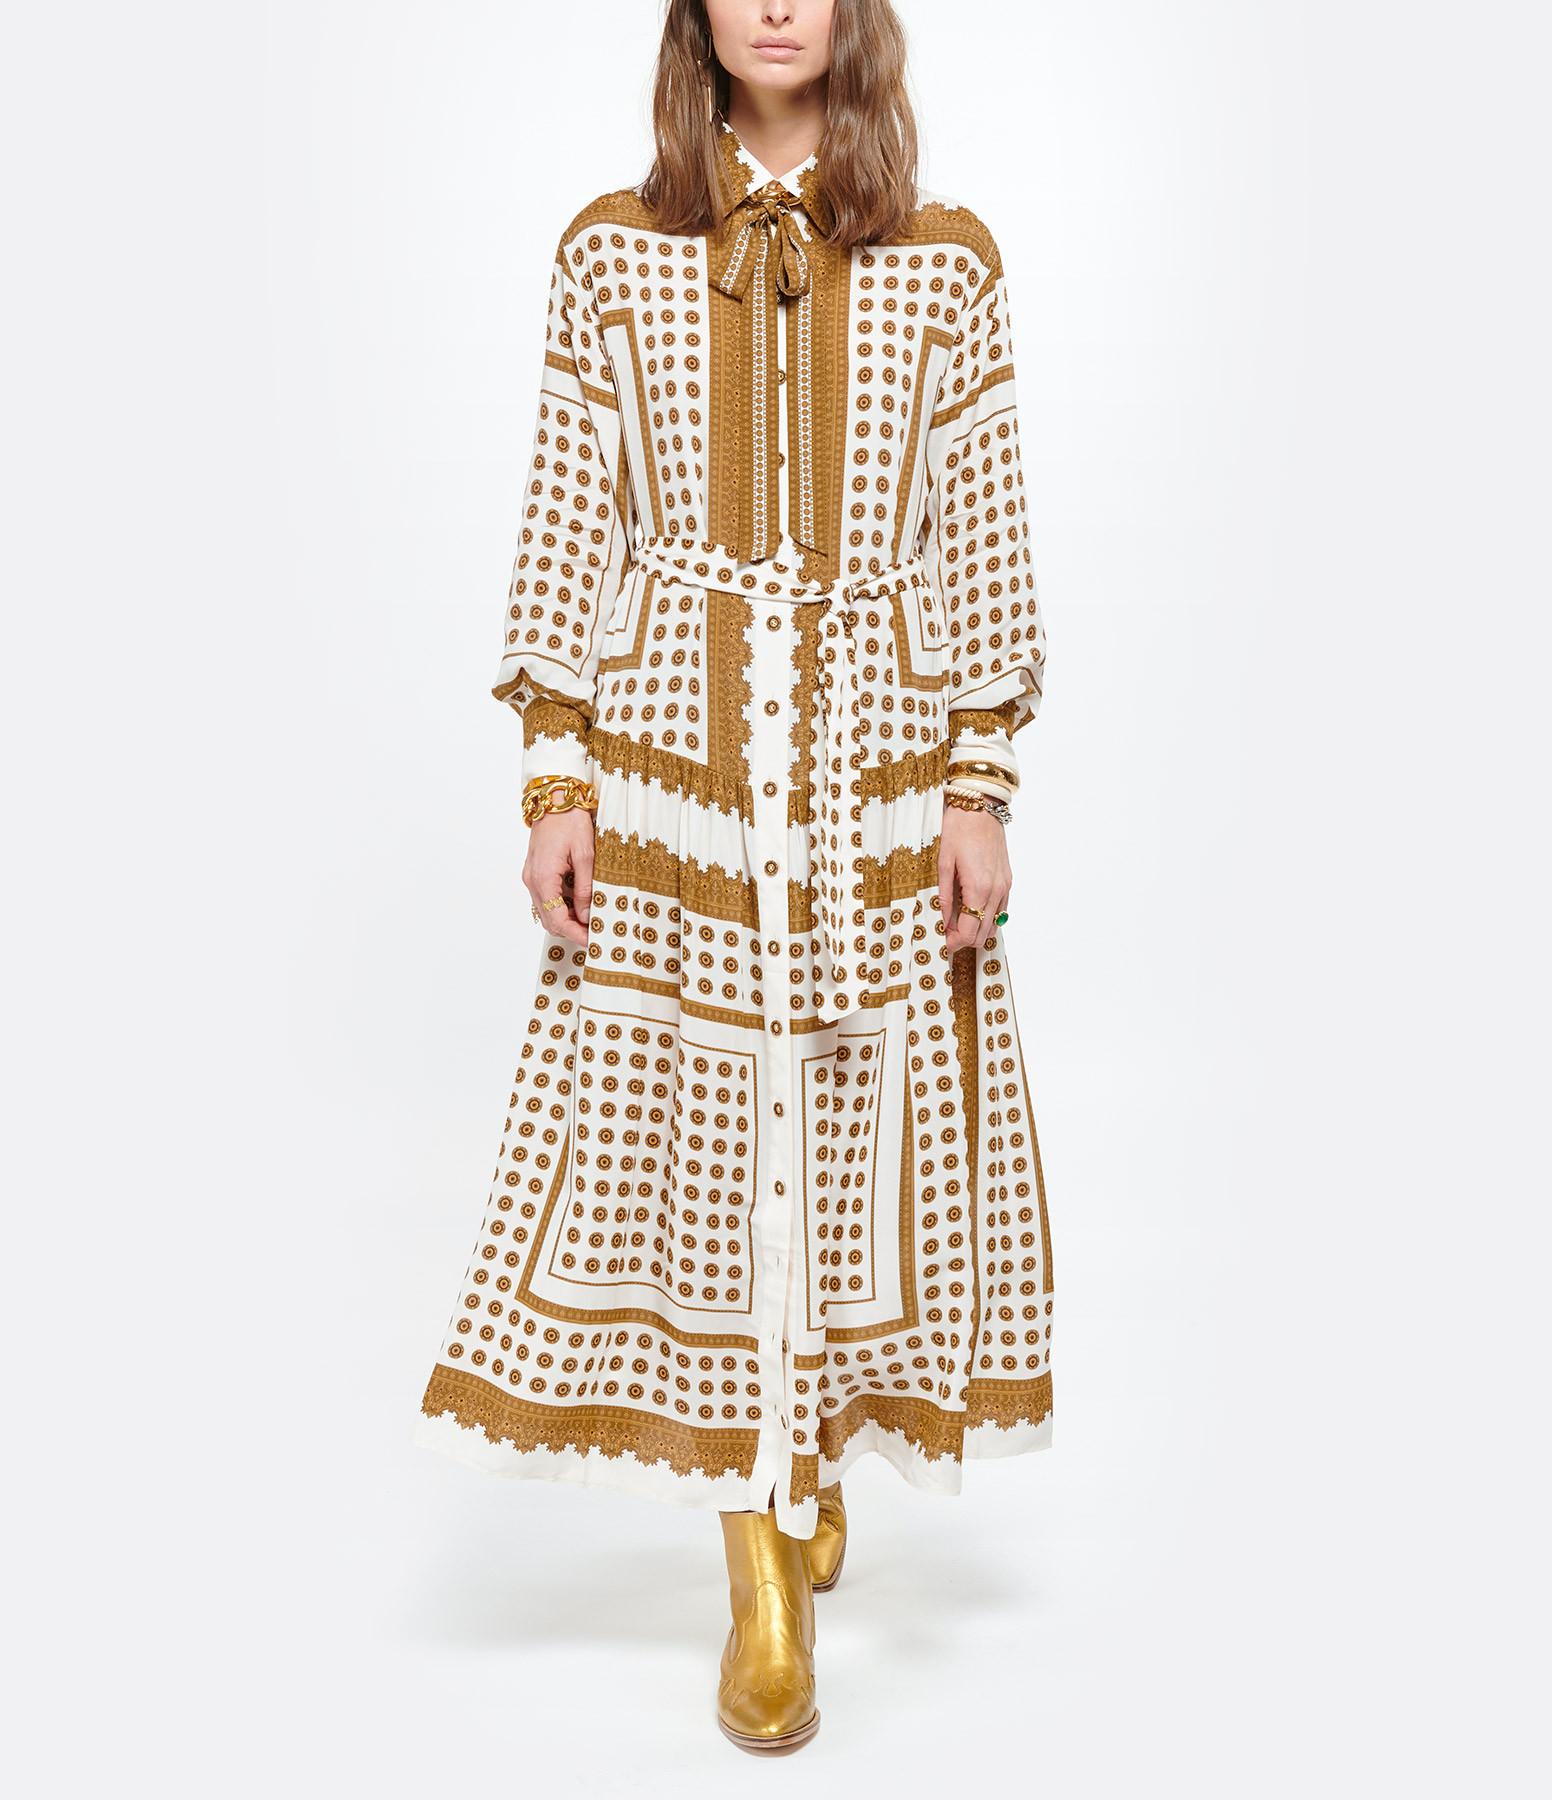 ZIMMERMANN - Robe Midi Imprimé Pois Marron